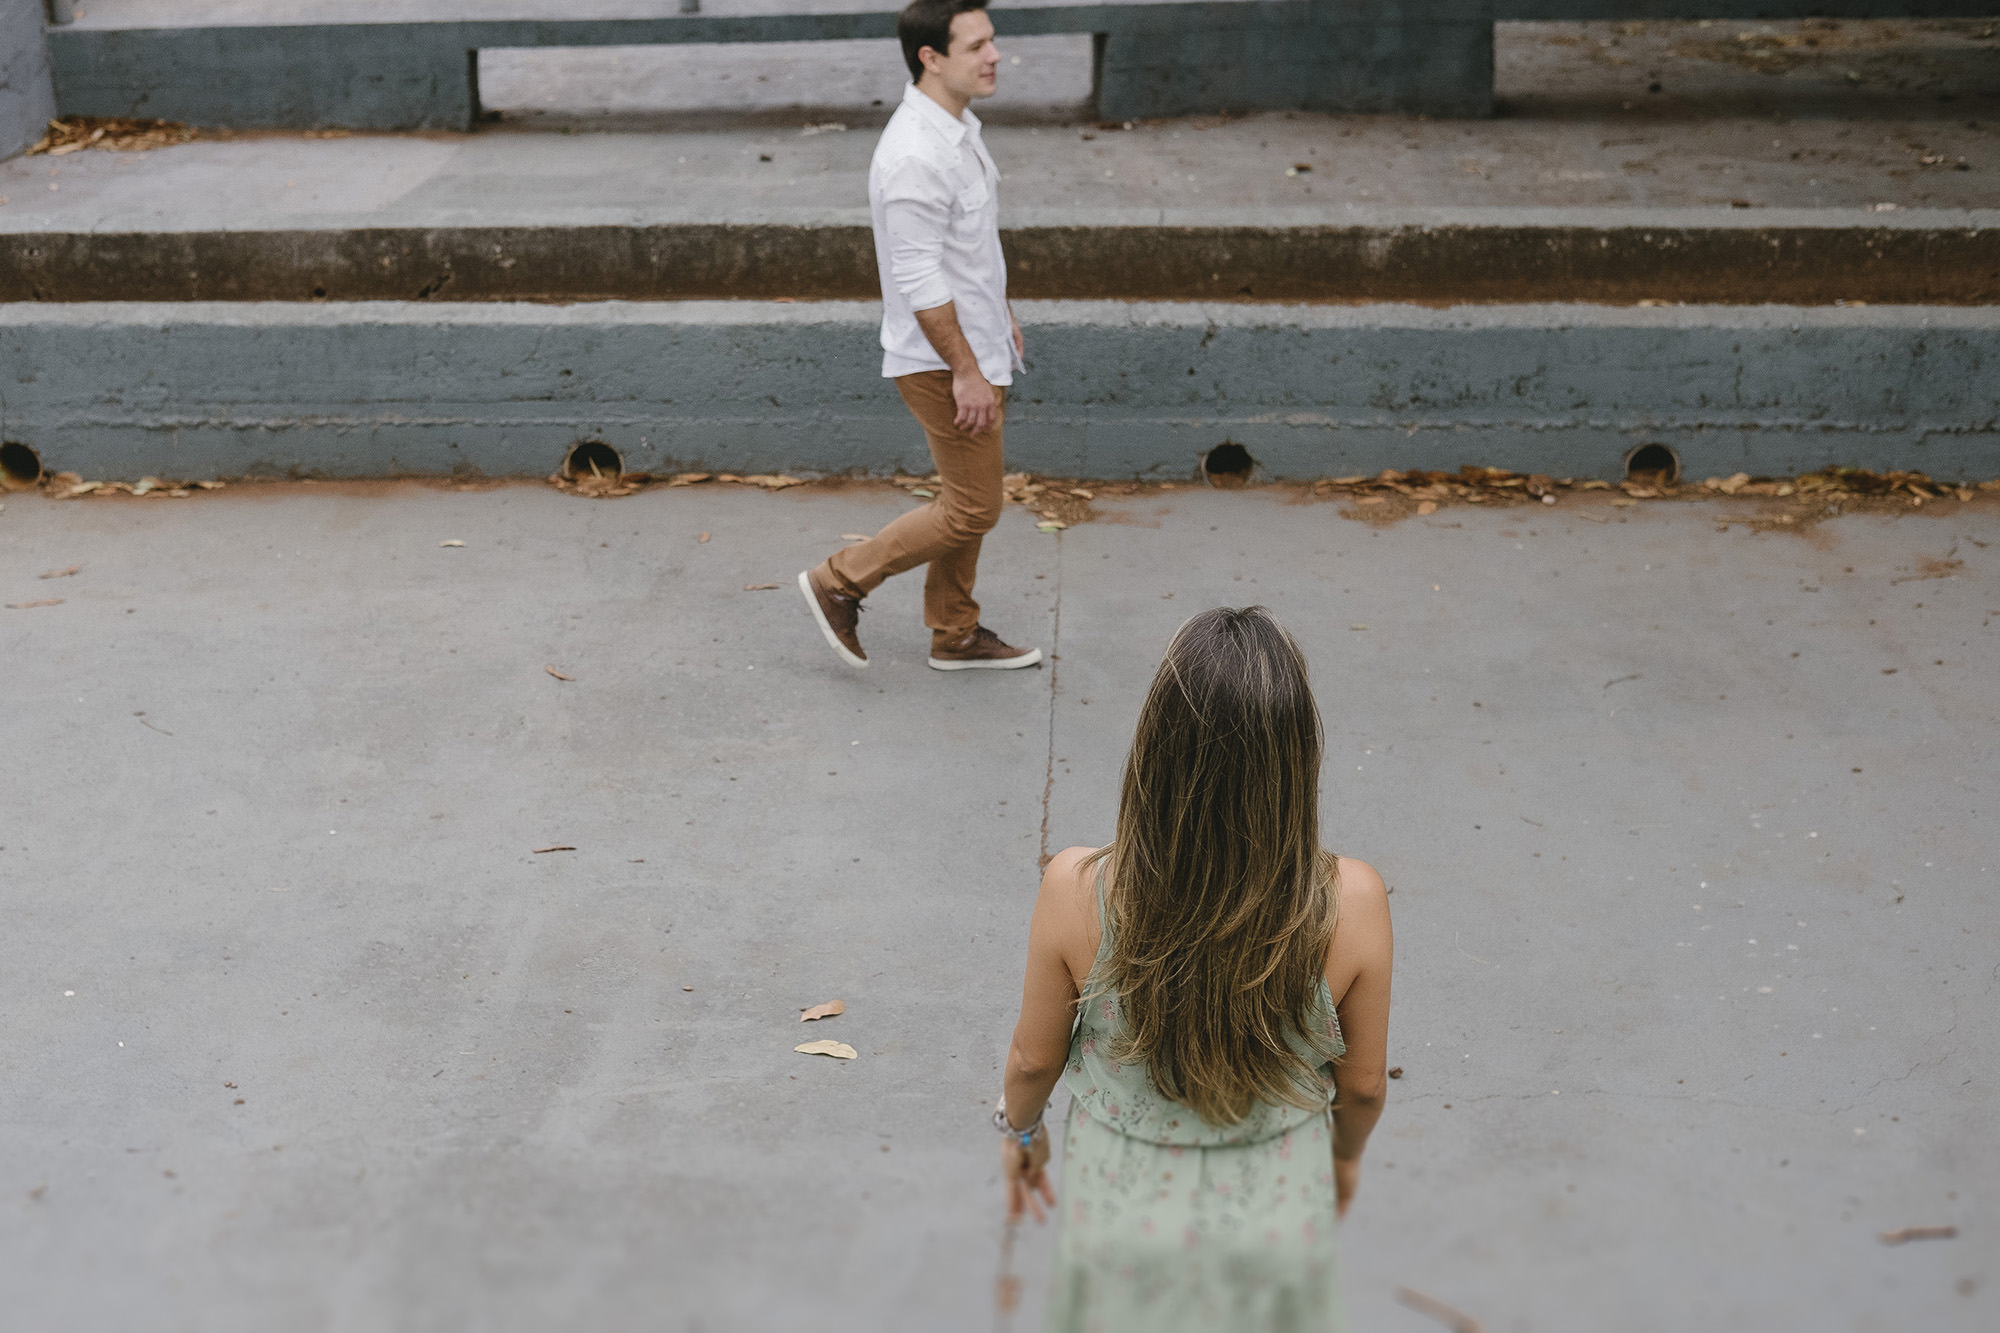 Laura e Rodrigo - Gustavo Semeghini - Ensaio - 02.jpg